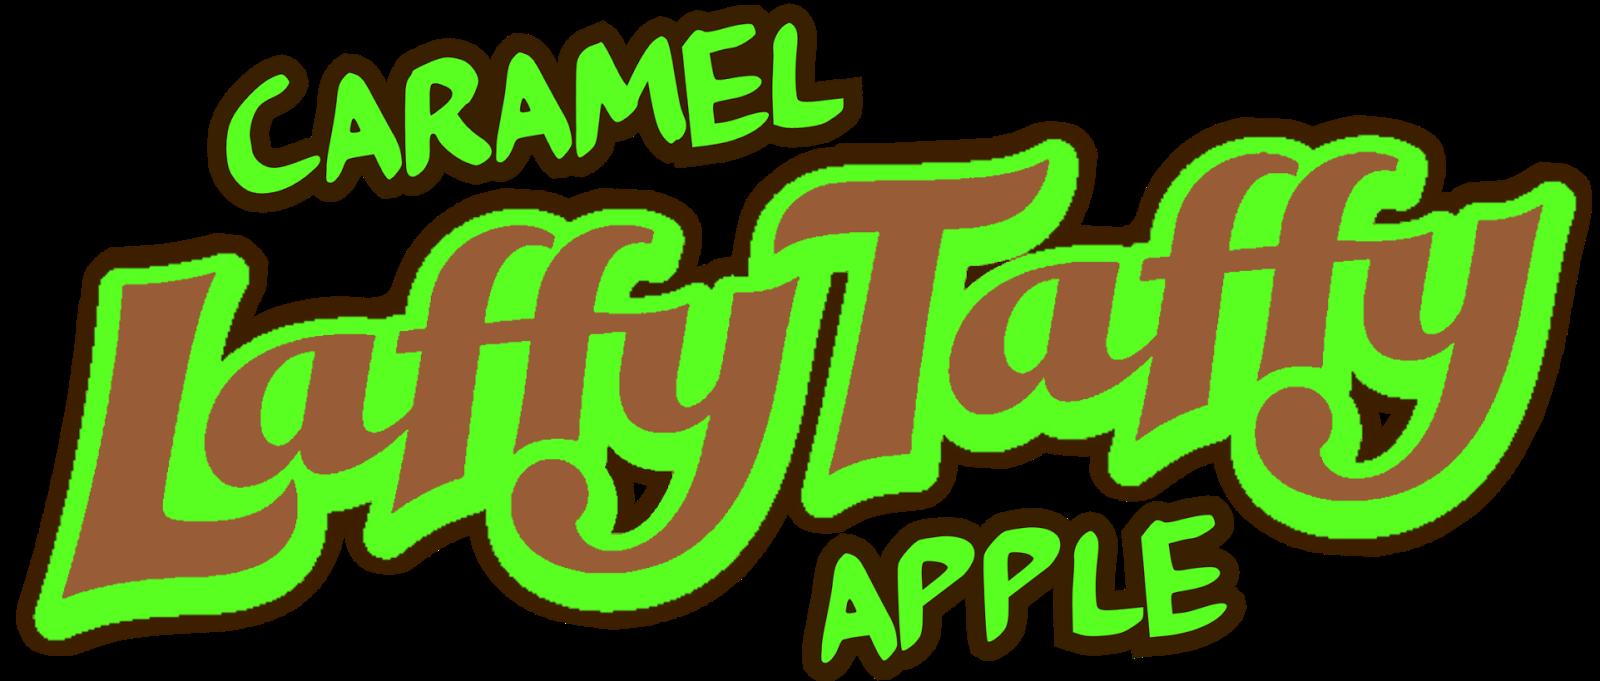 Pumpkin spice oreo clipart clip transparent The Holidaze: Caramel Apple Laffy Taffy clip transparent